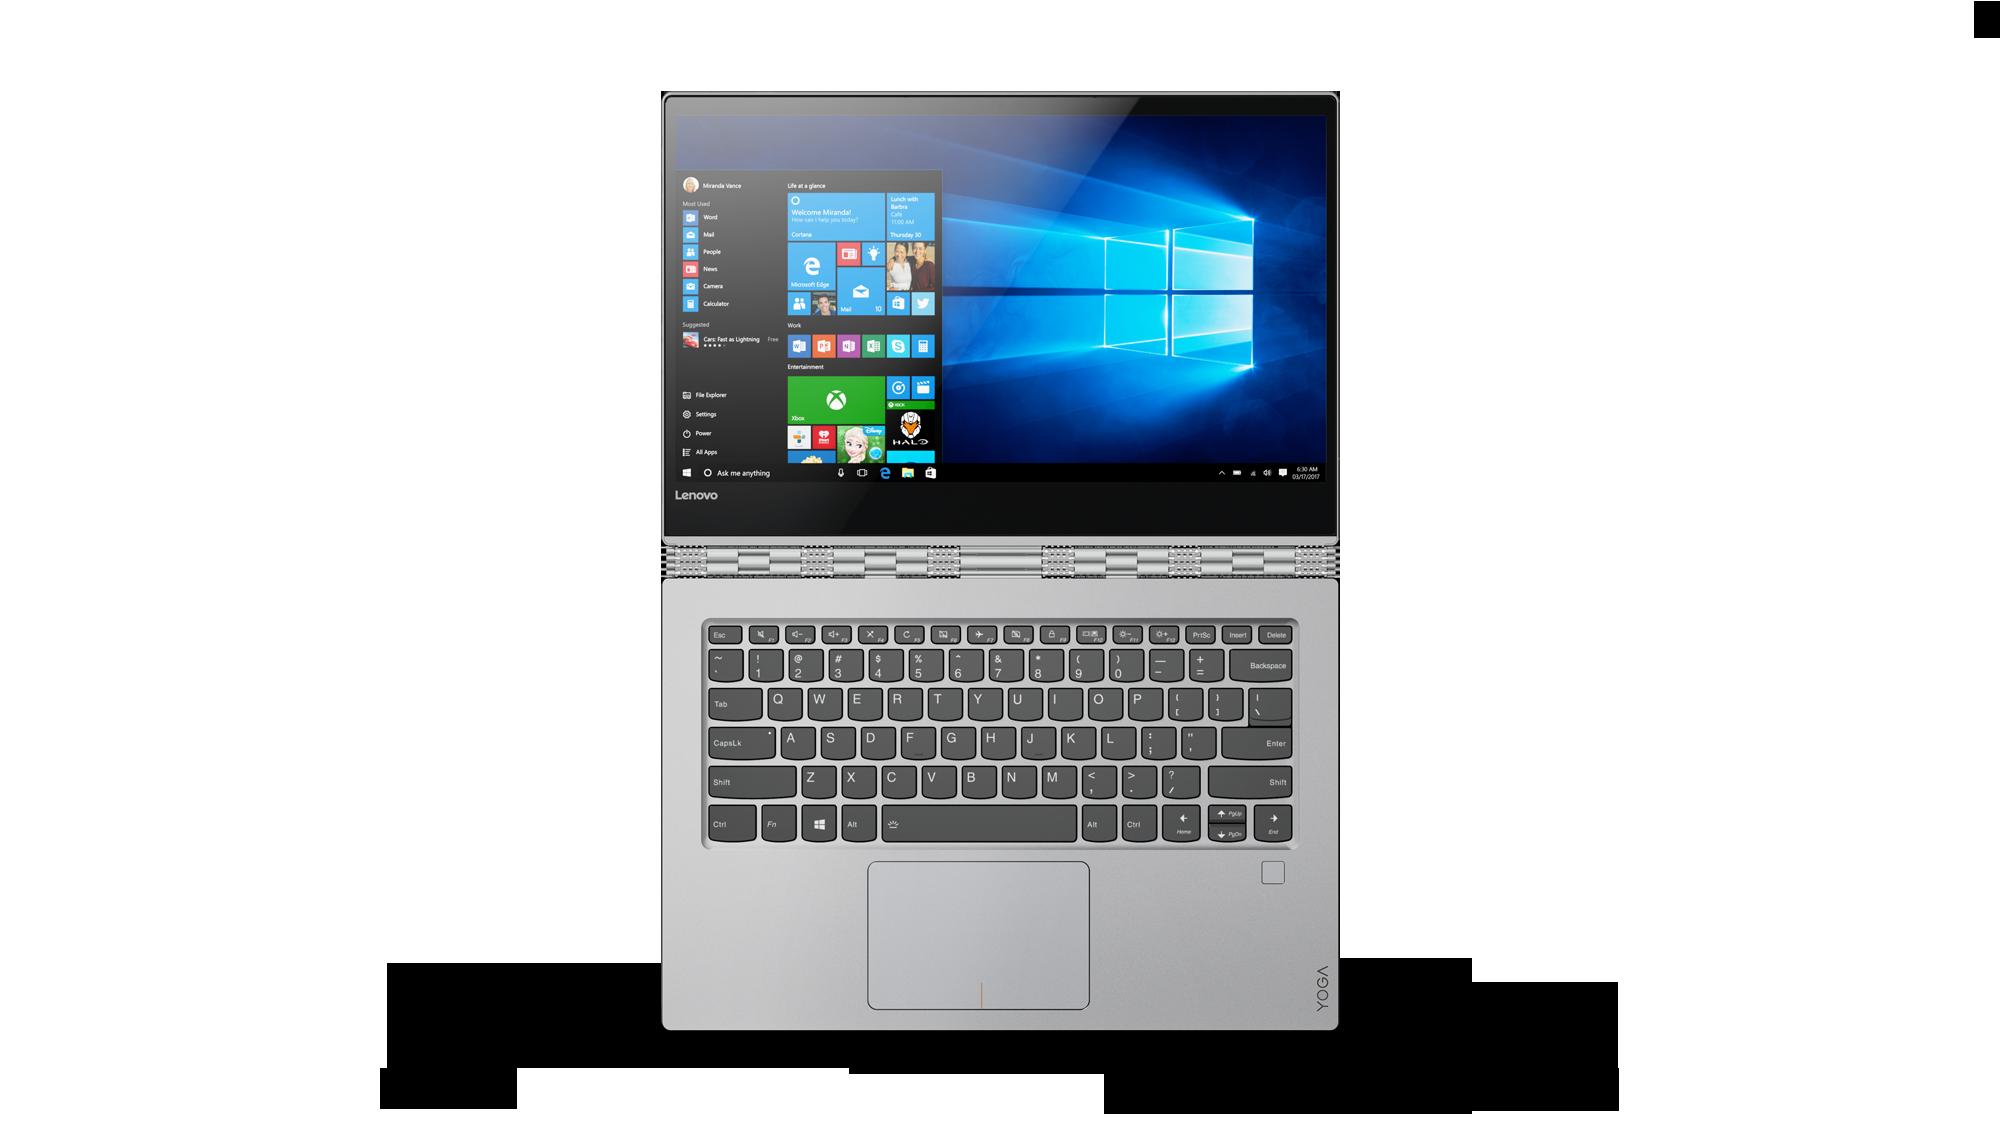 Lenovo YOGA 920 13.9''UHD T/i7-8550U/16G/512SSD/INT/W10H - Star Wars EDICE